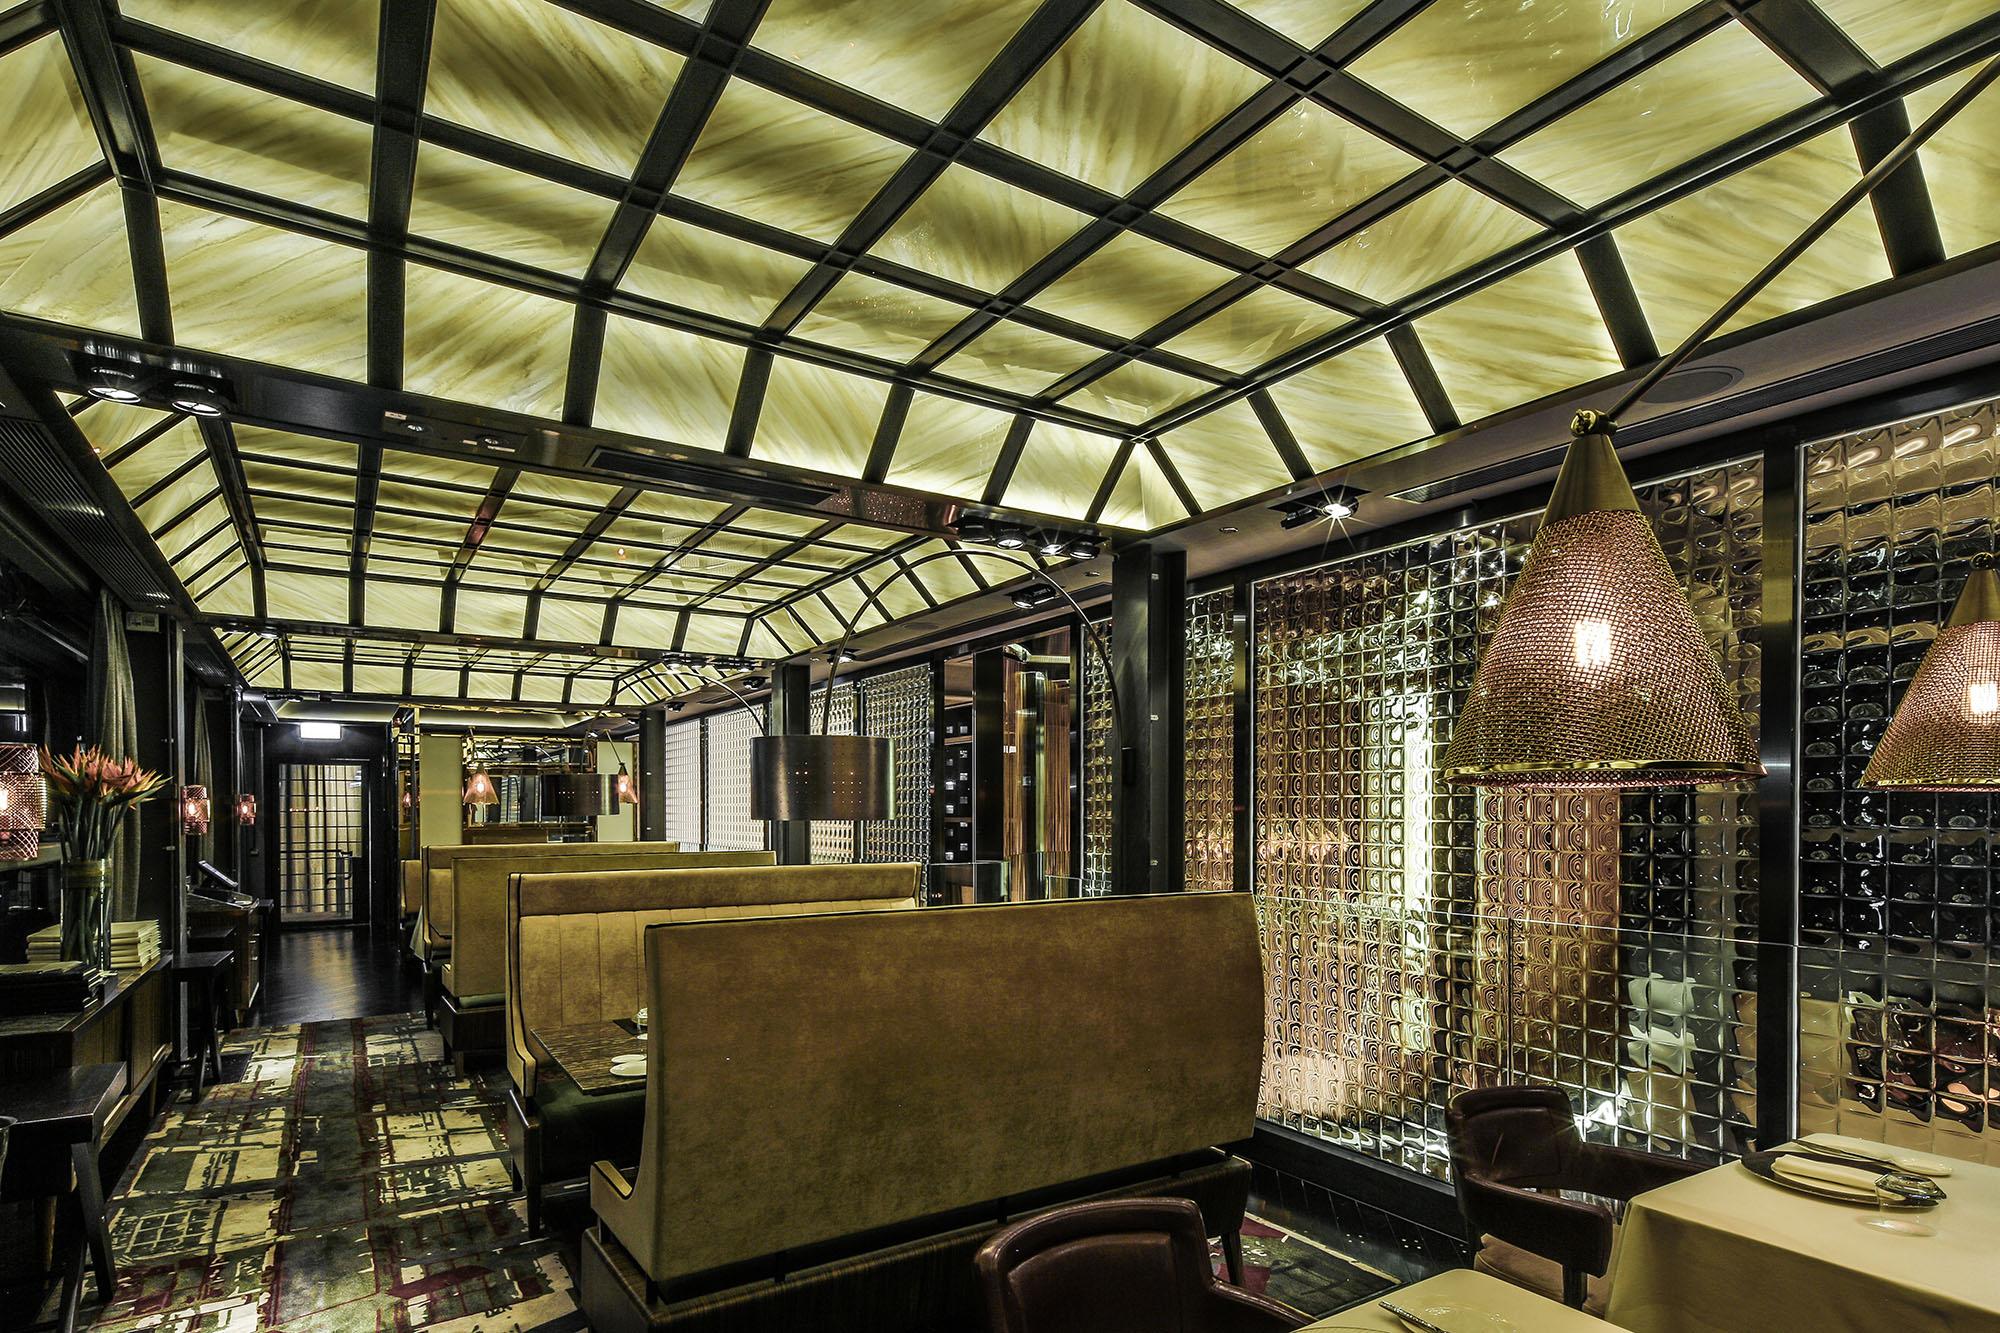 vasco restaurant review  u2013 everyday i u2019m truffling